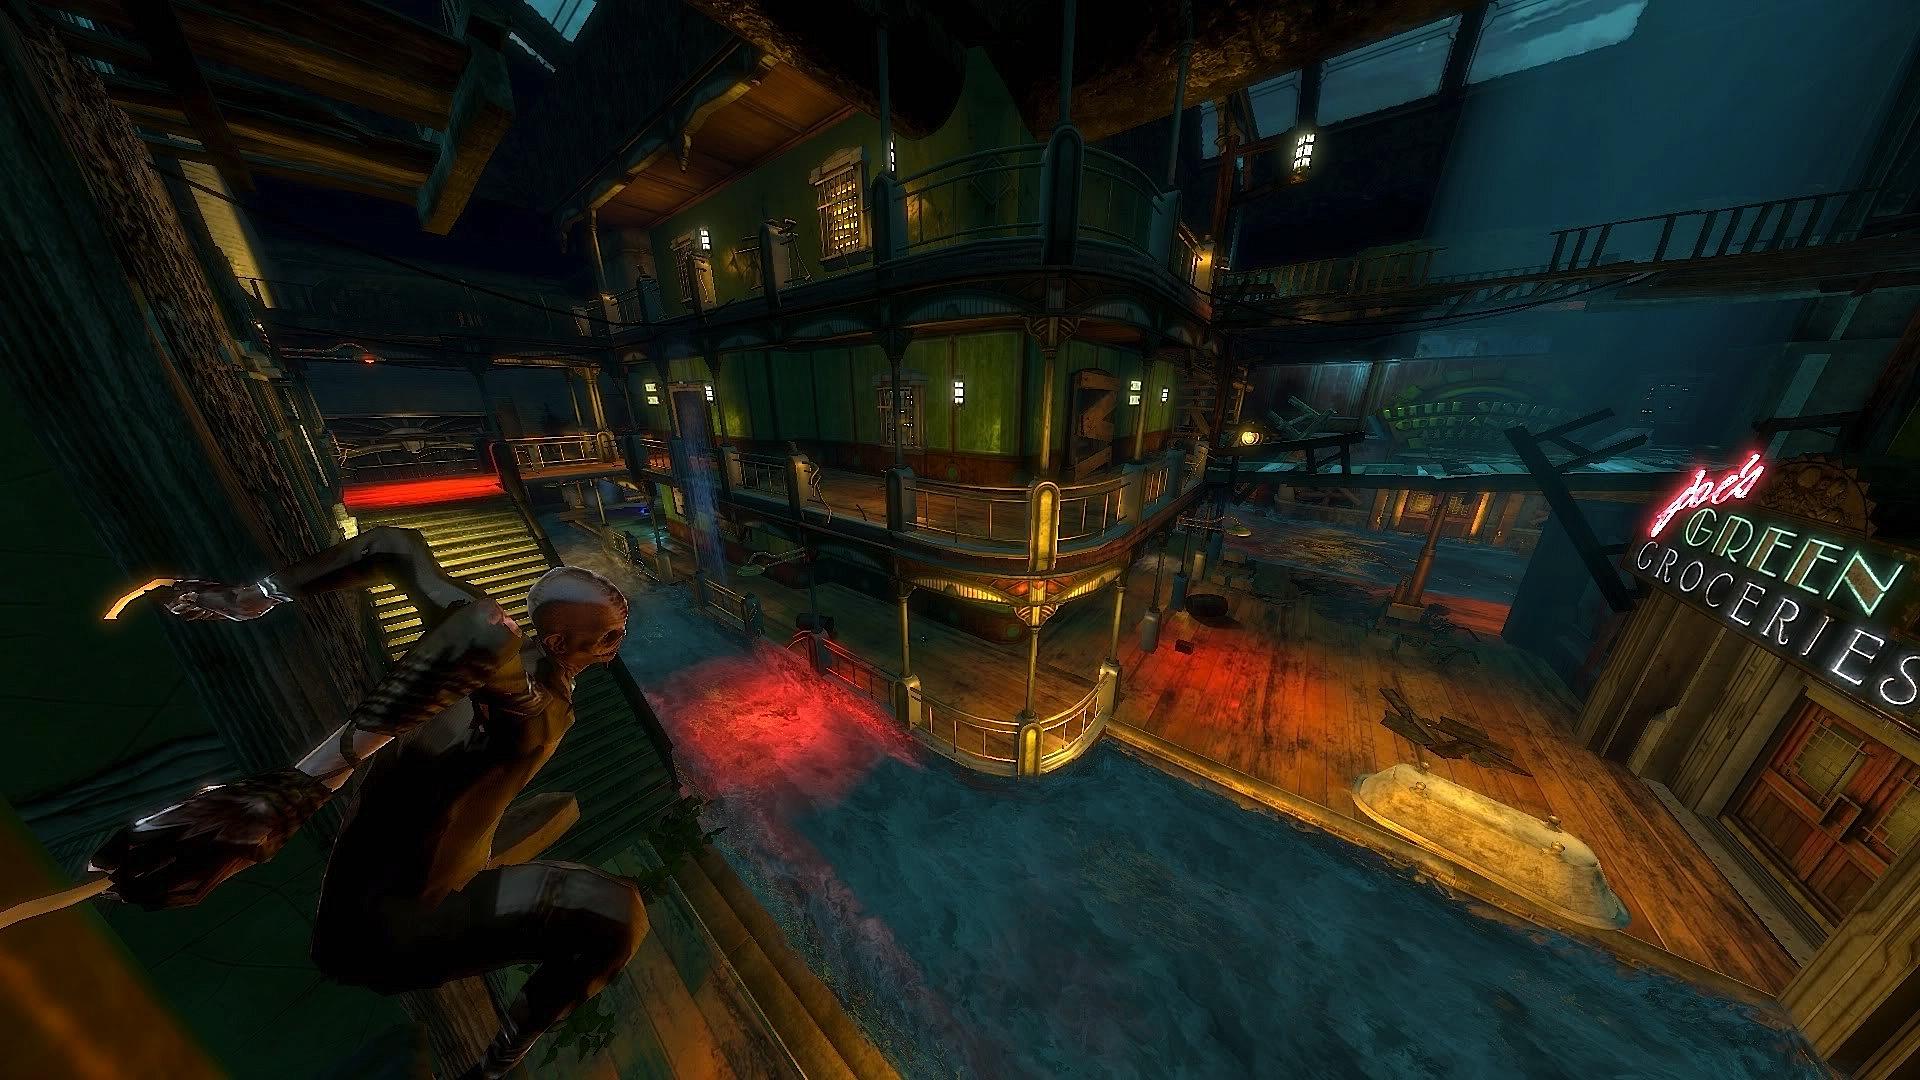 BioShock 2 - Siren Alley - Mermaid Lounge | WikiGameGuides - YouTube